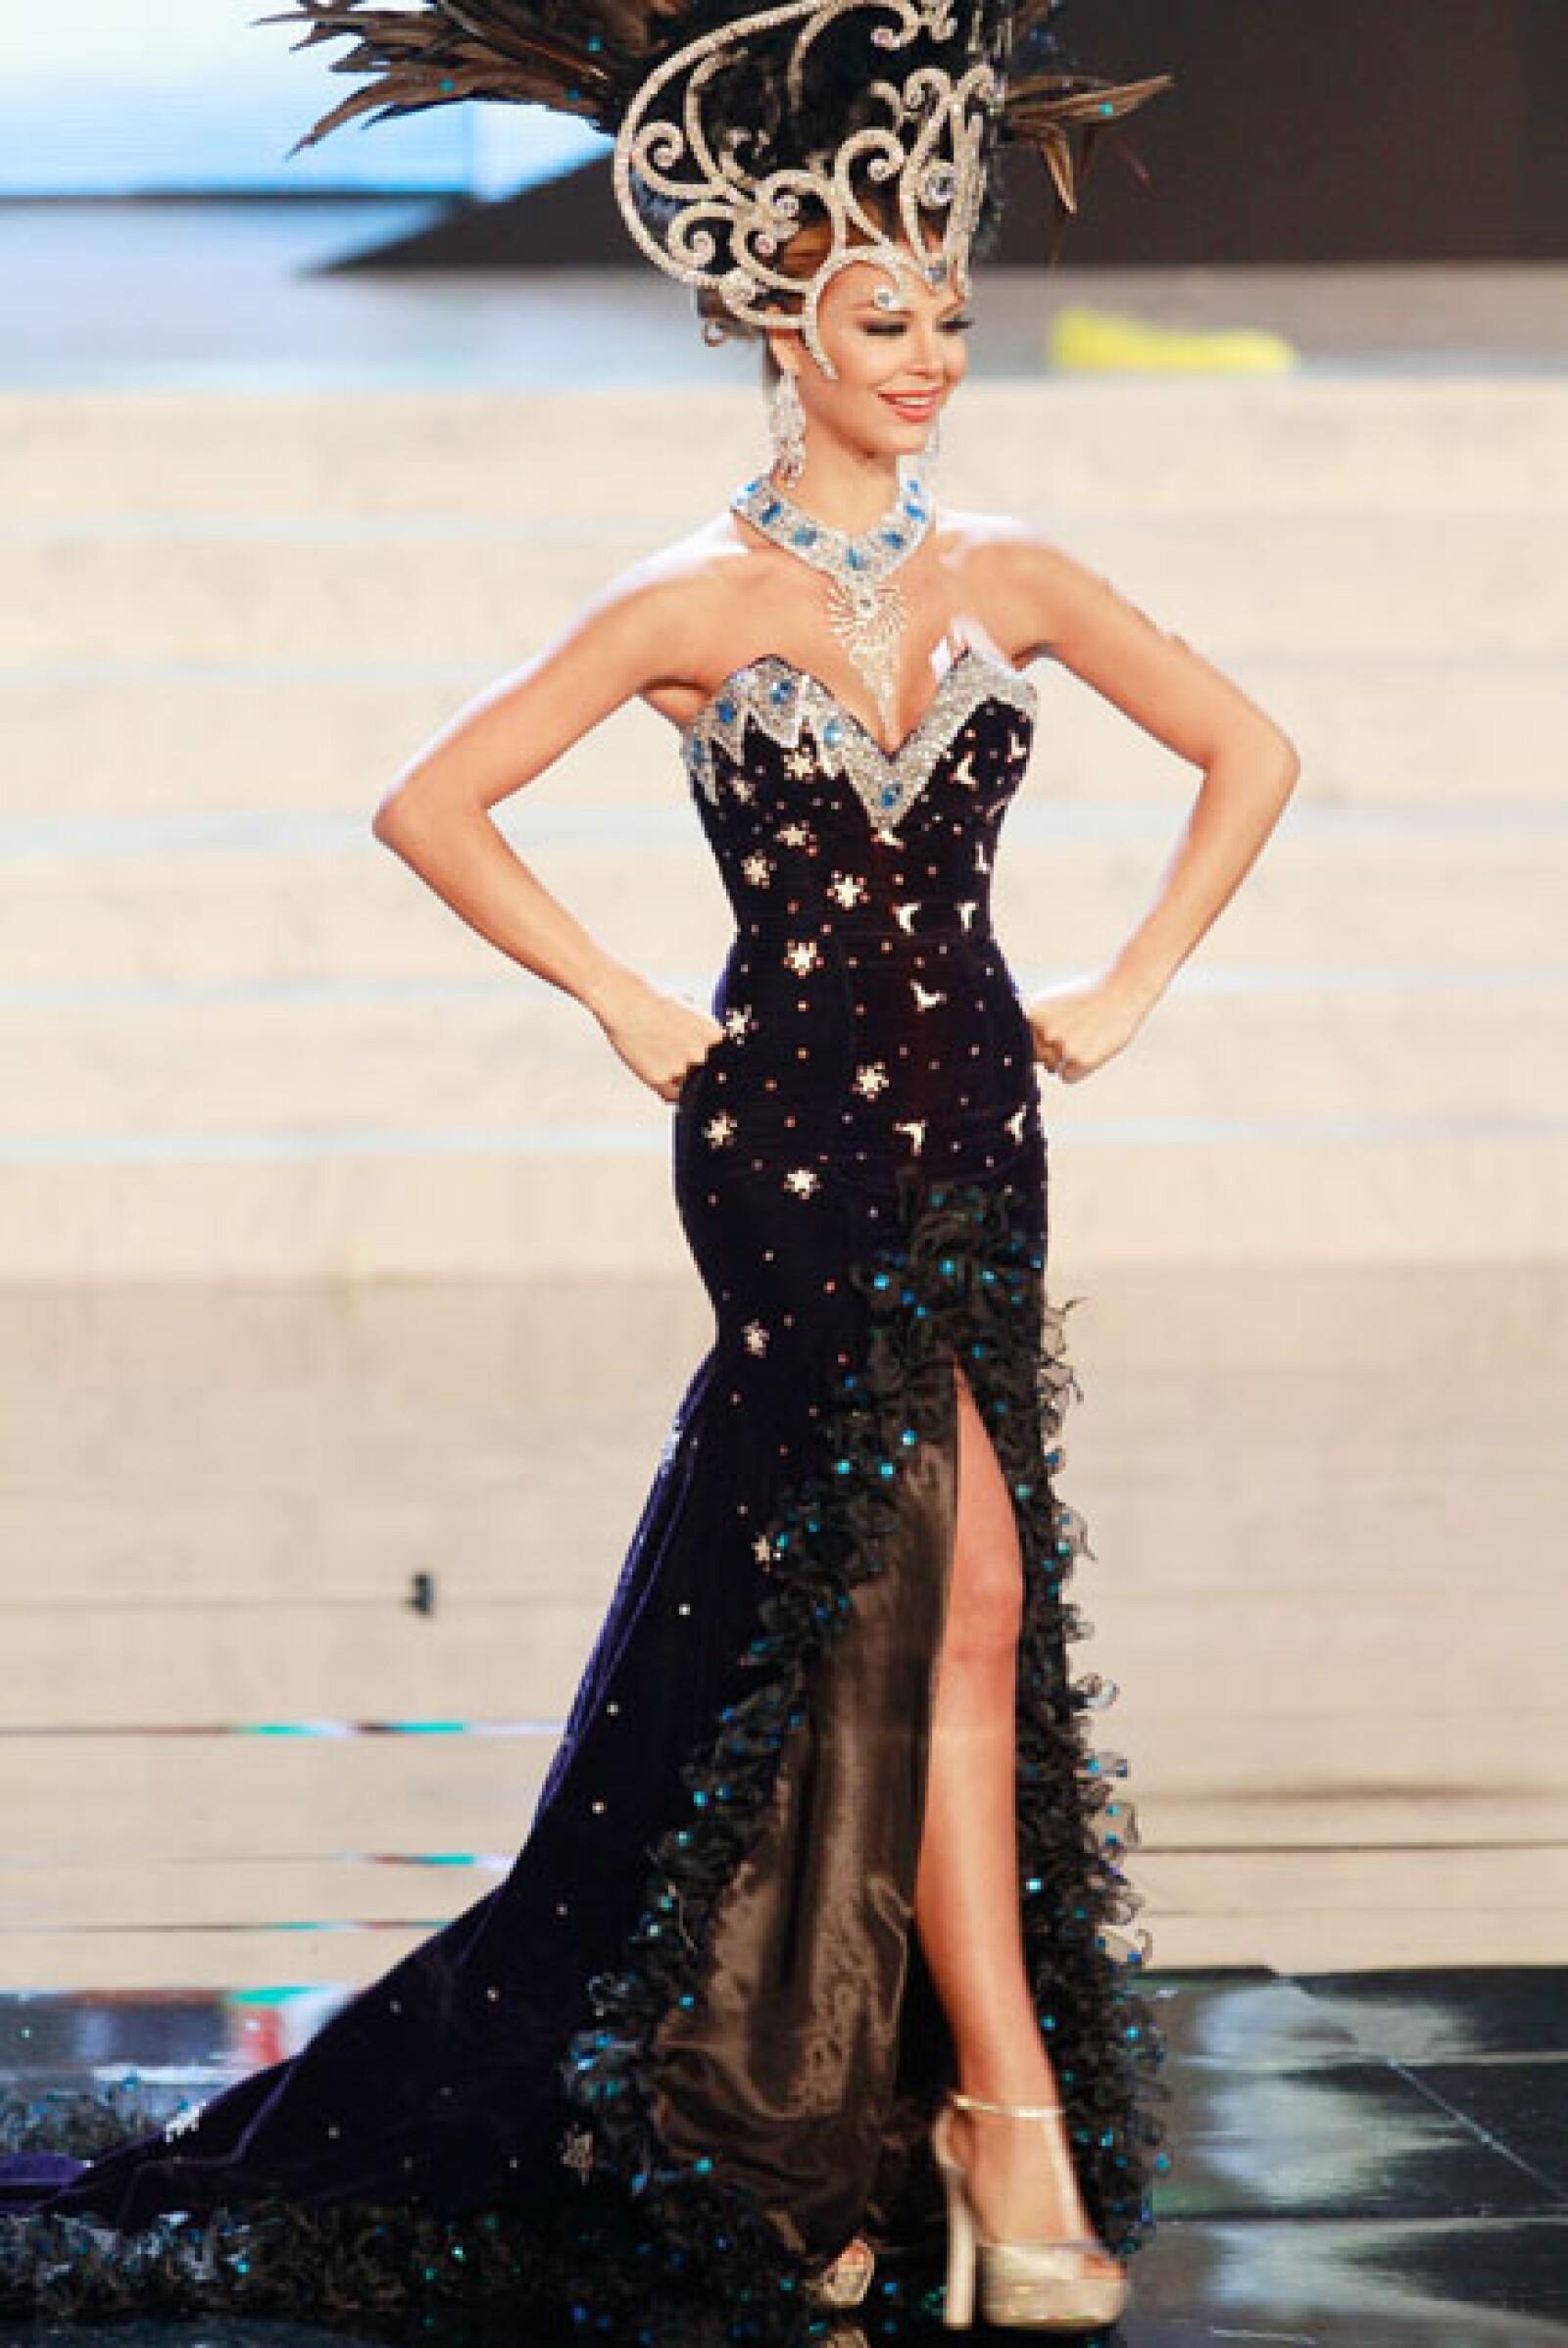 Miss Ucrania, Anastasia Chernova.